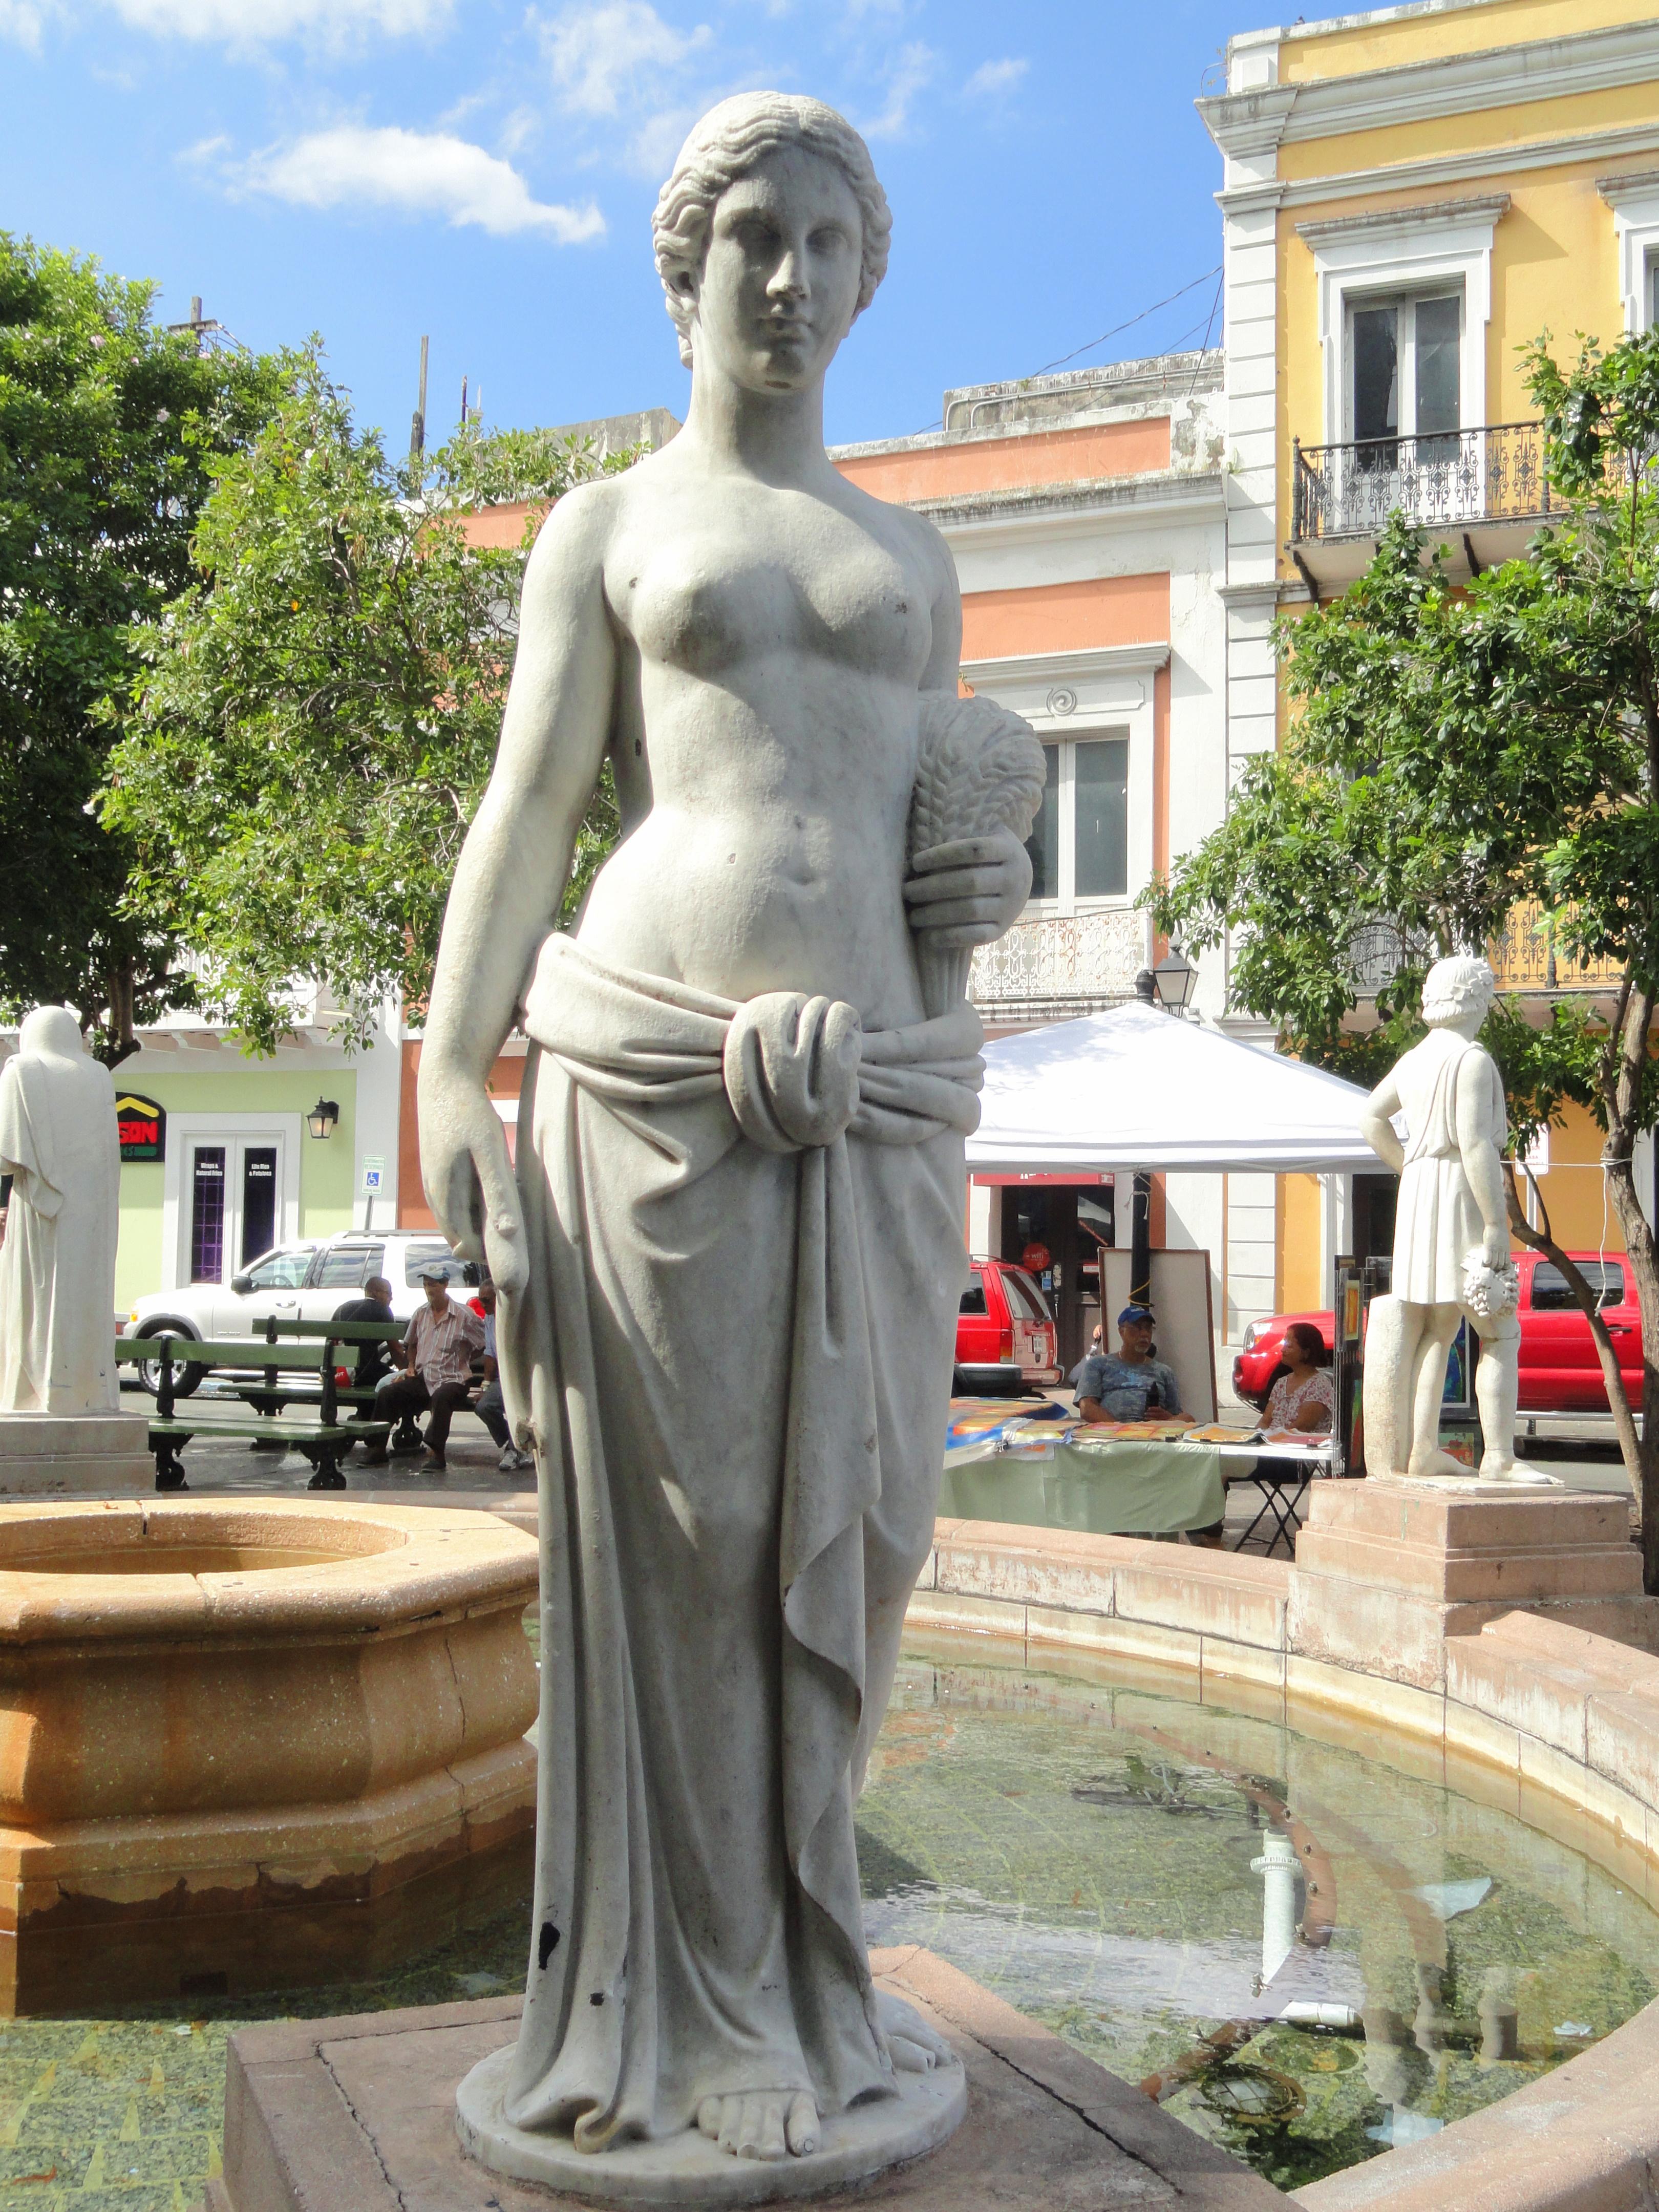 Description plaza de armas fountain san juan puerto rico dsc07110